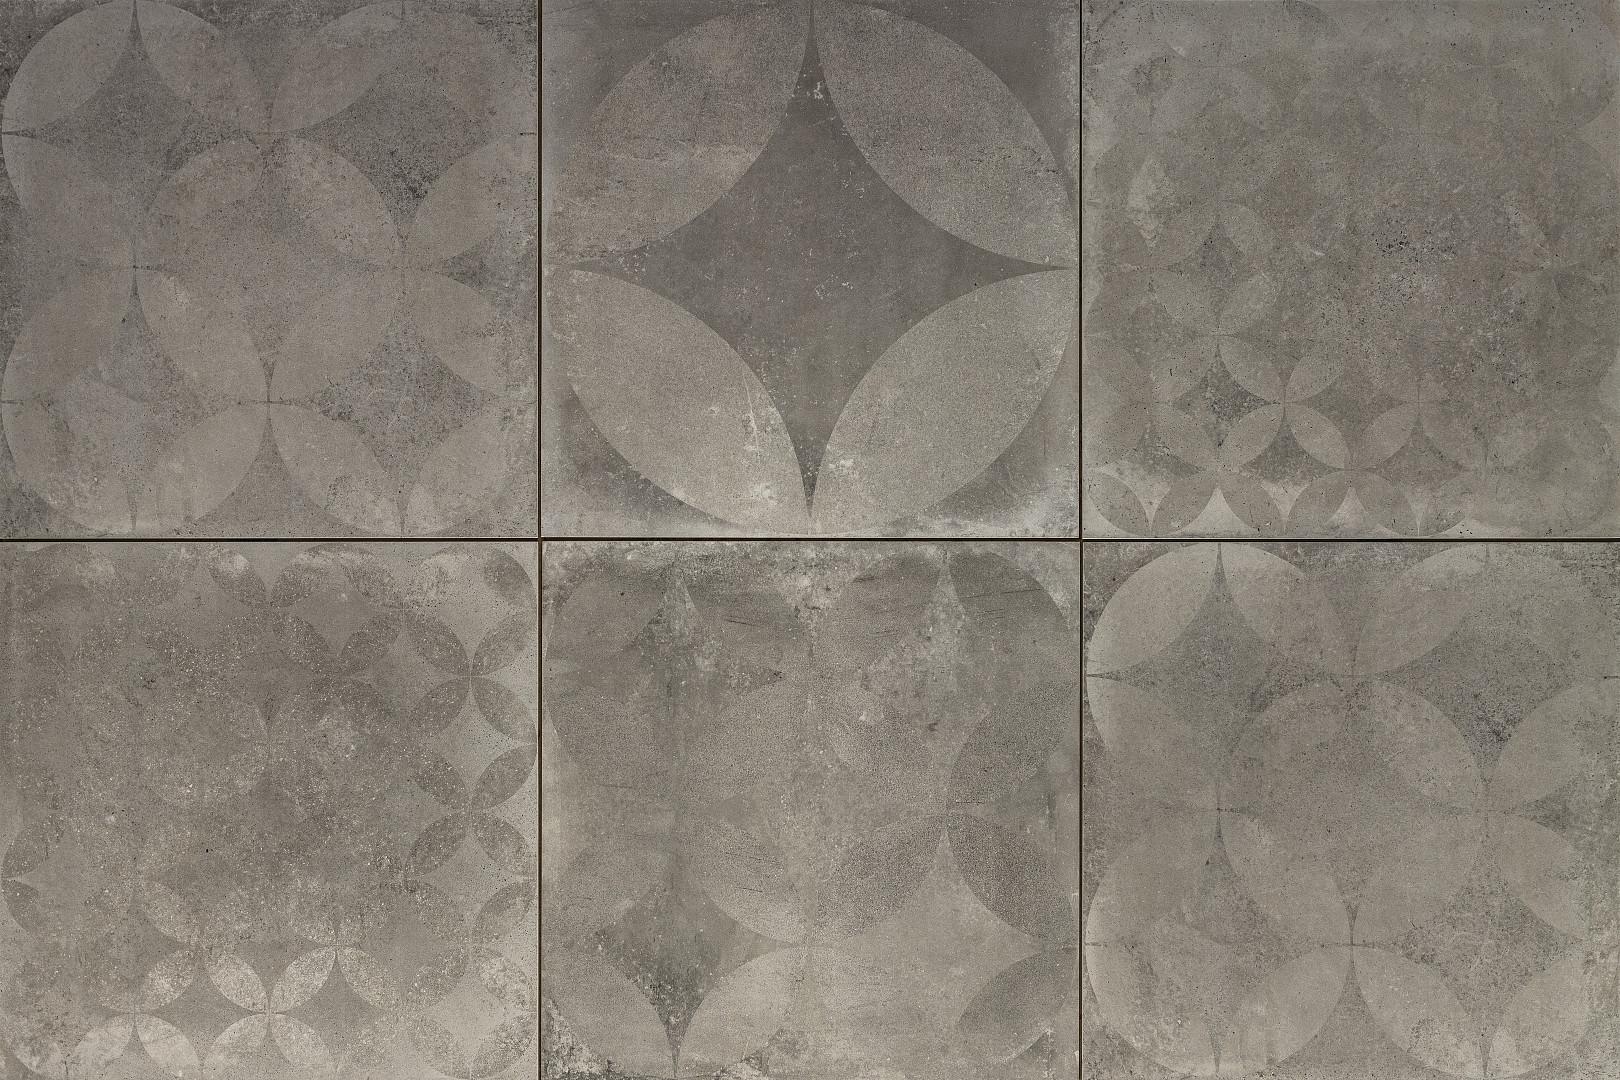 CERASUN Concrete Decor Ash 60x60x4